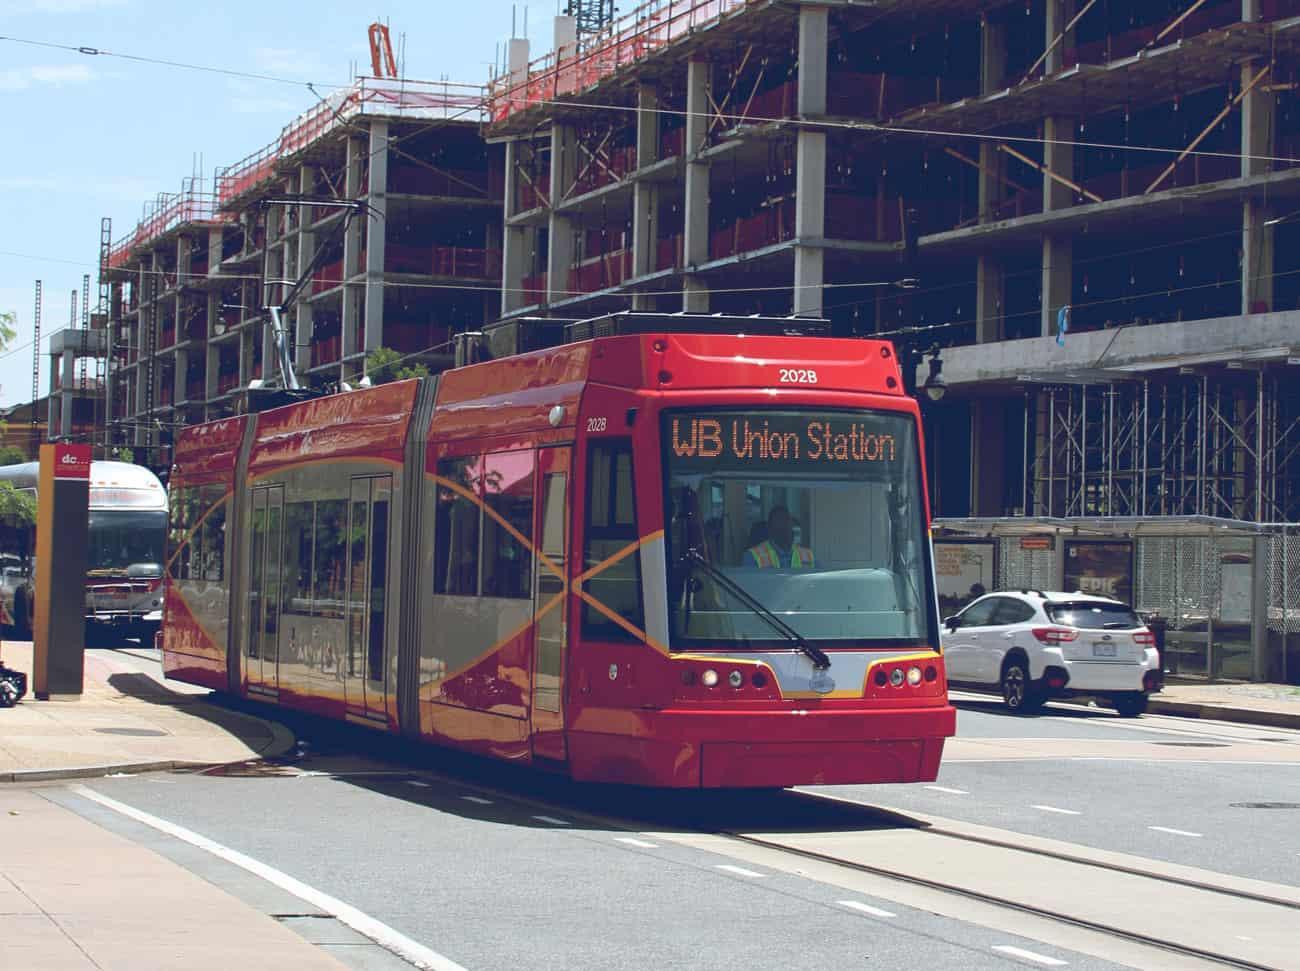 H Street public transportation